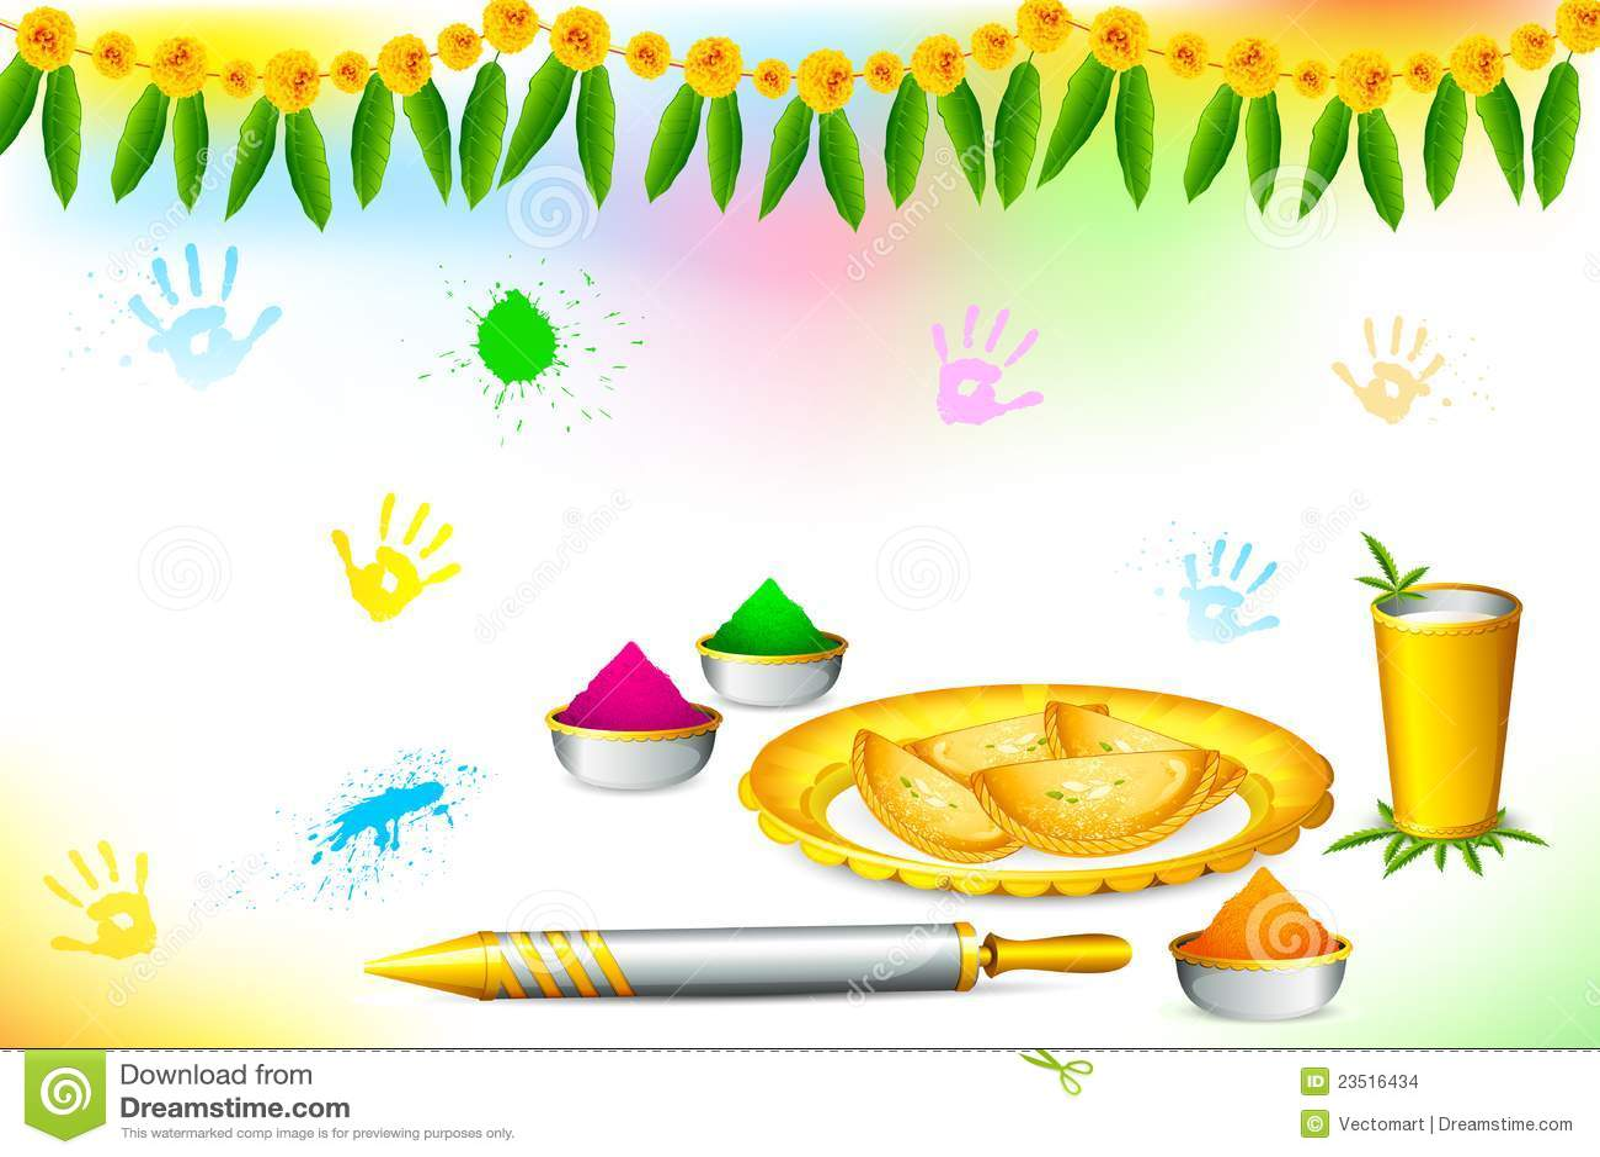 happy holi wallpaper stock vector. illustration of artistic - 23516434